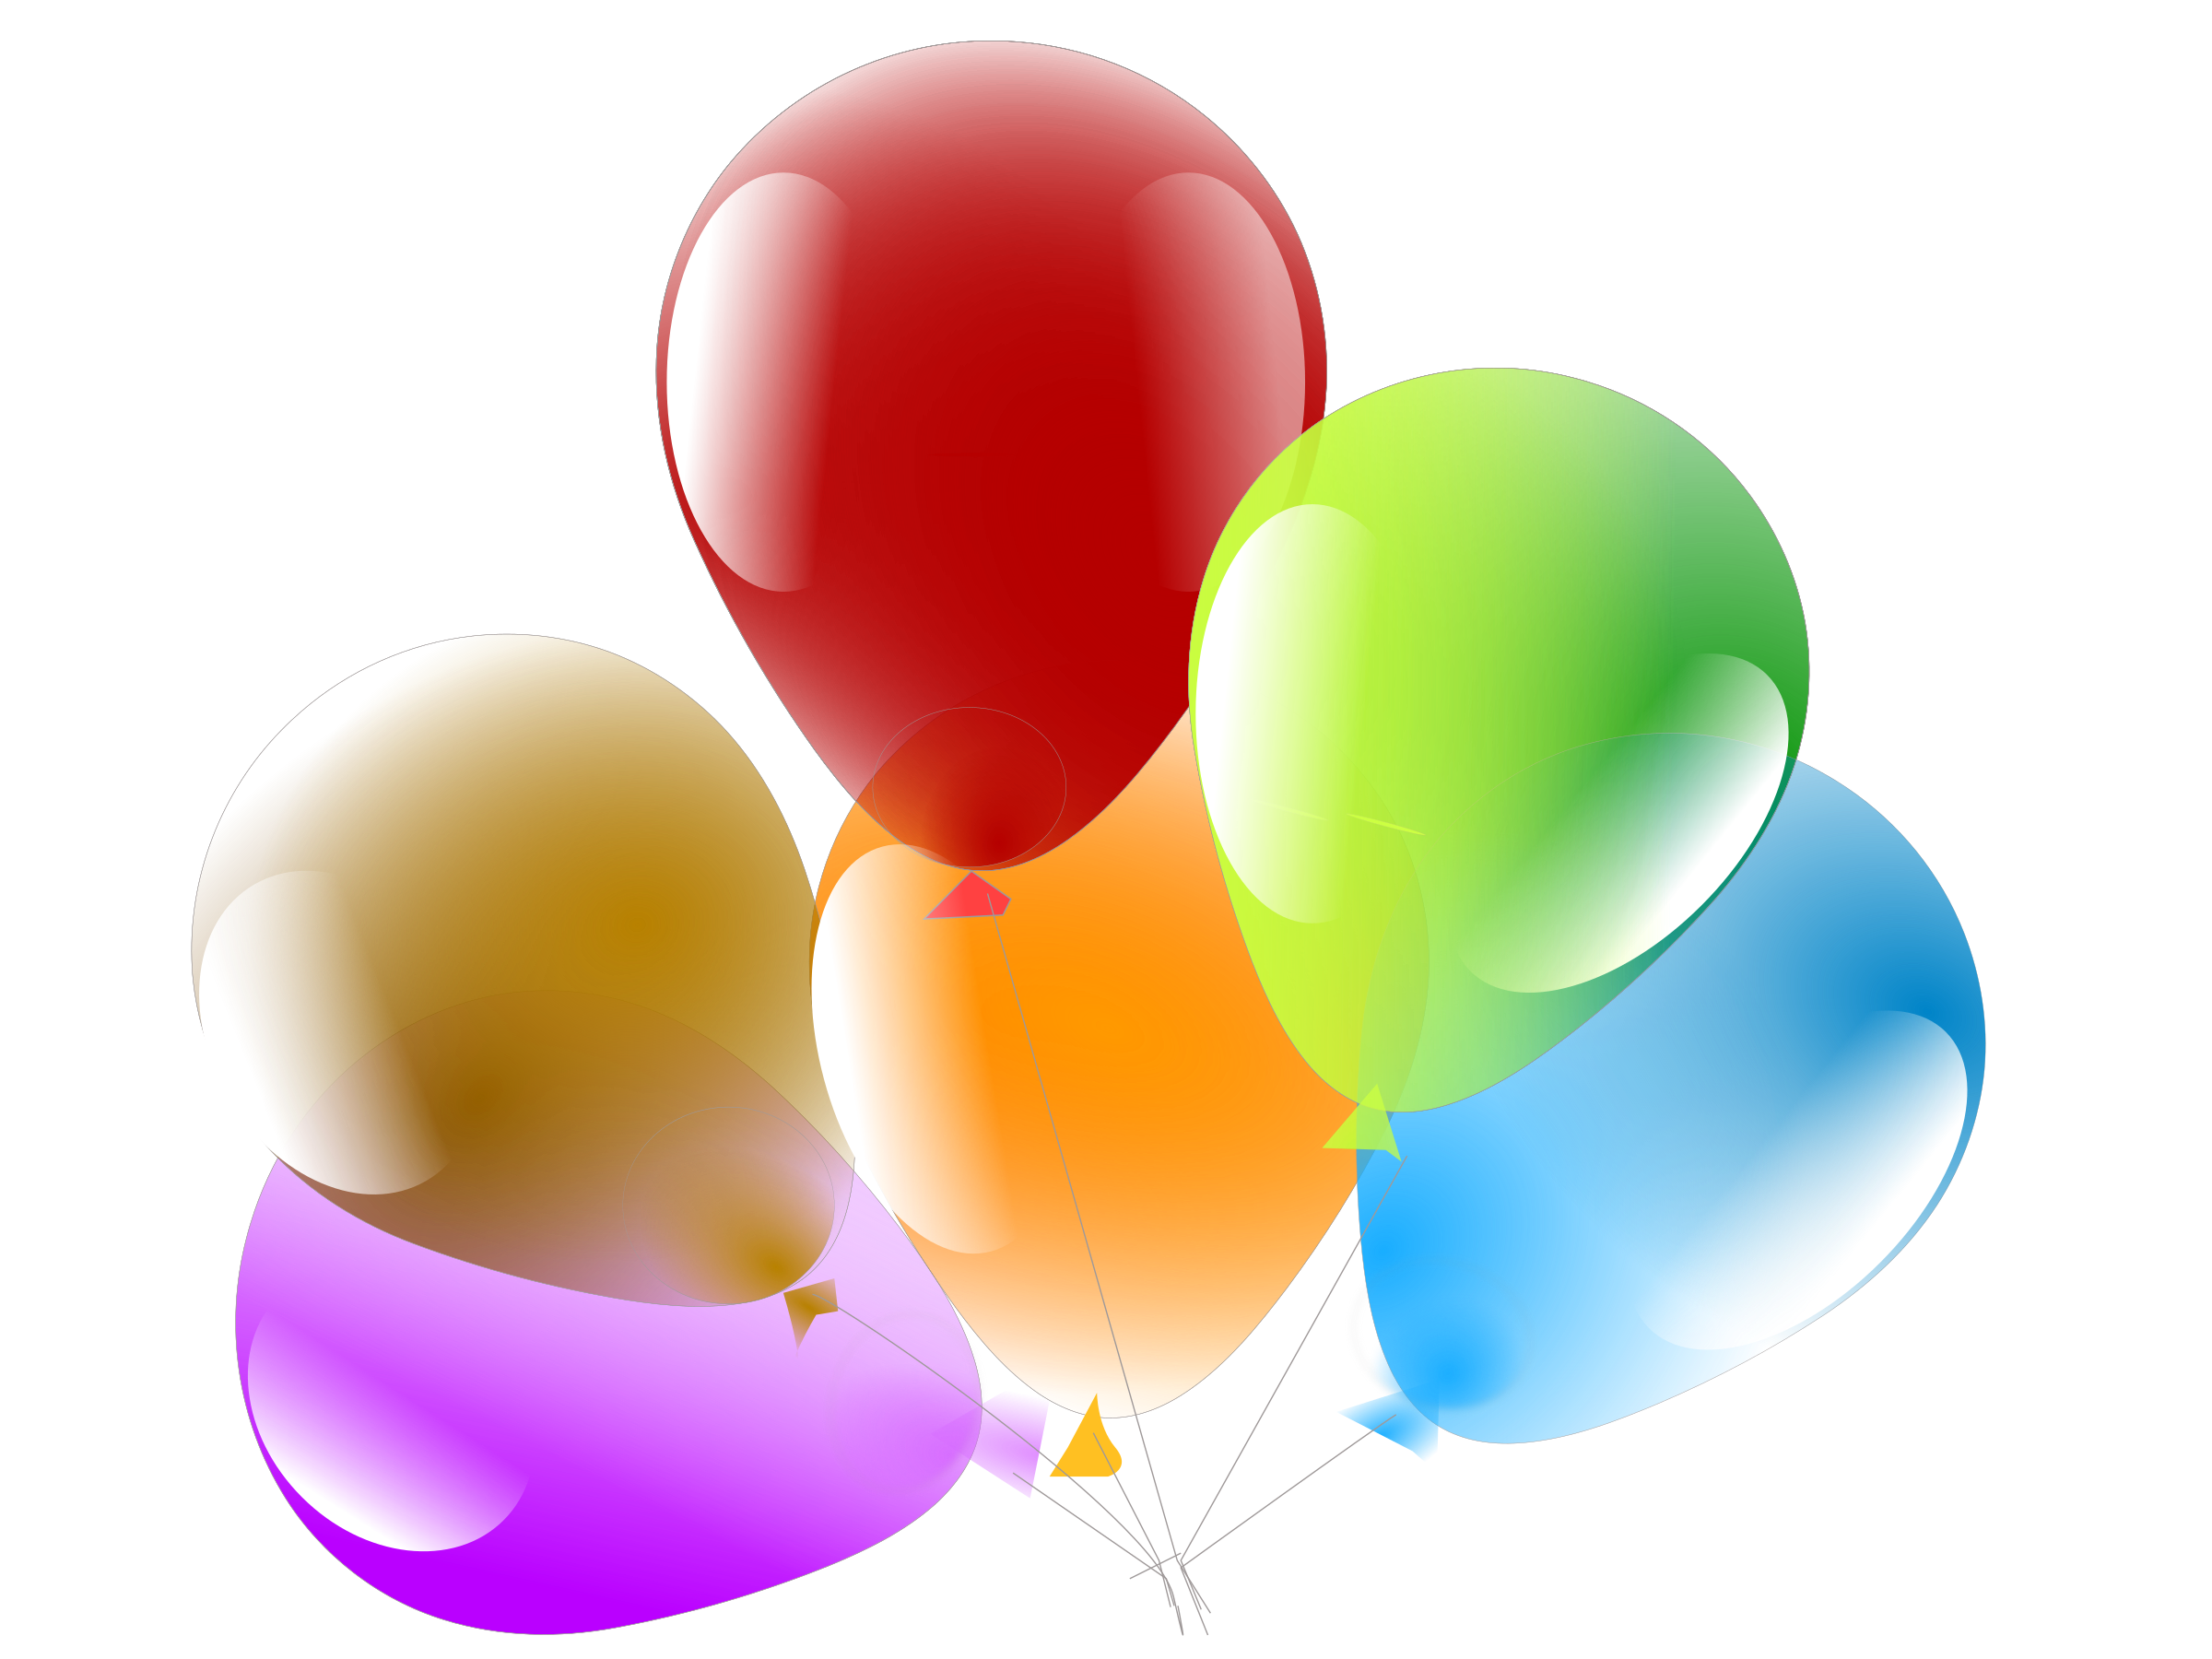 Balloons big image png. Clipart balloon six